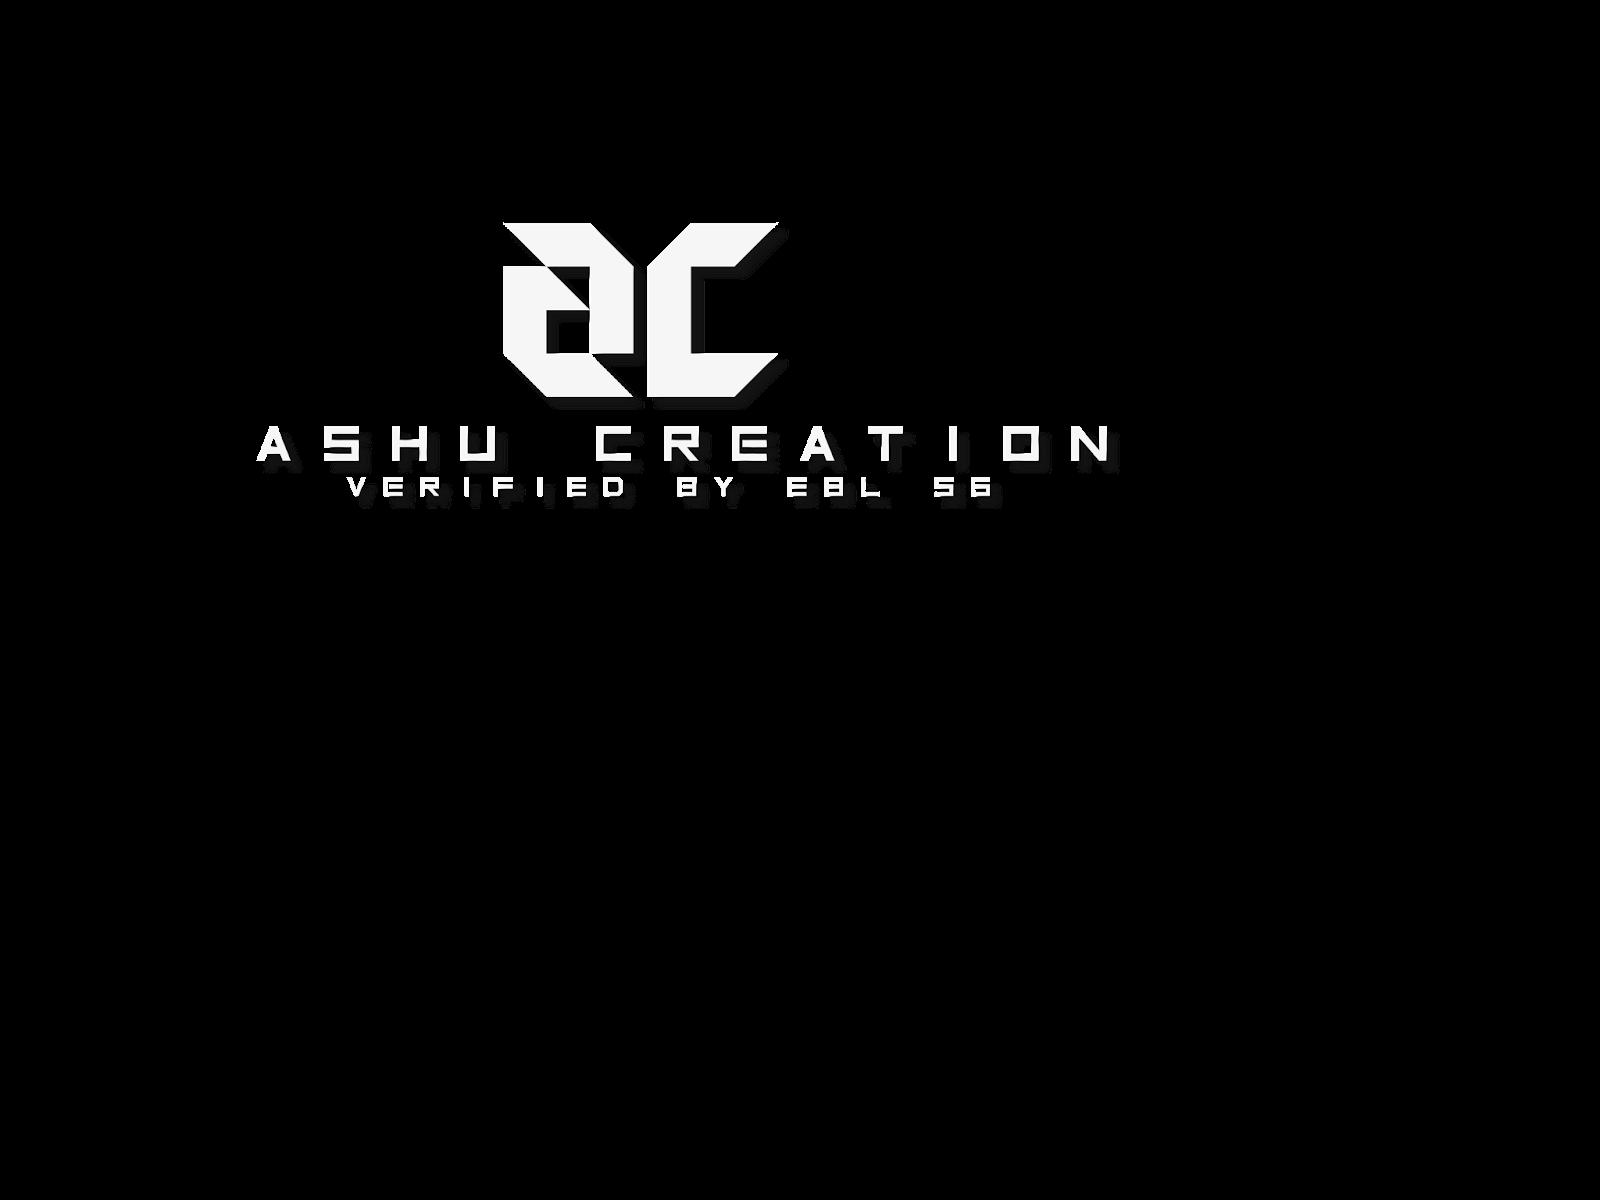 Proffesional EdiTor AshU: My name logo.